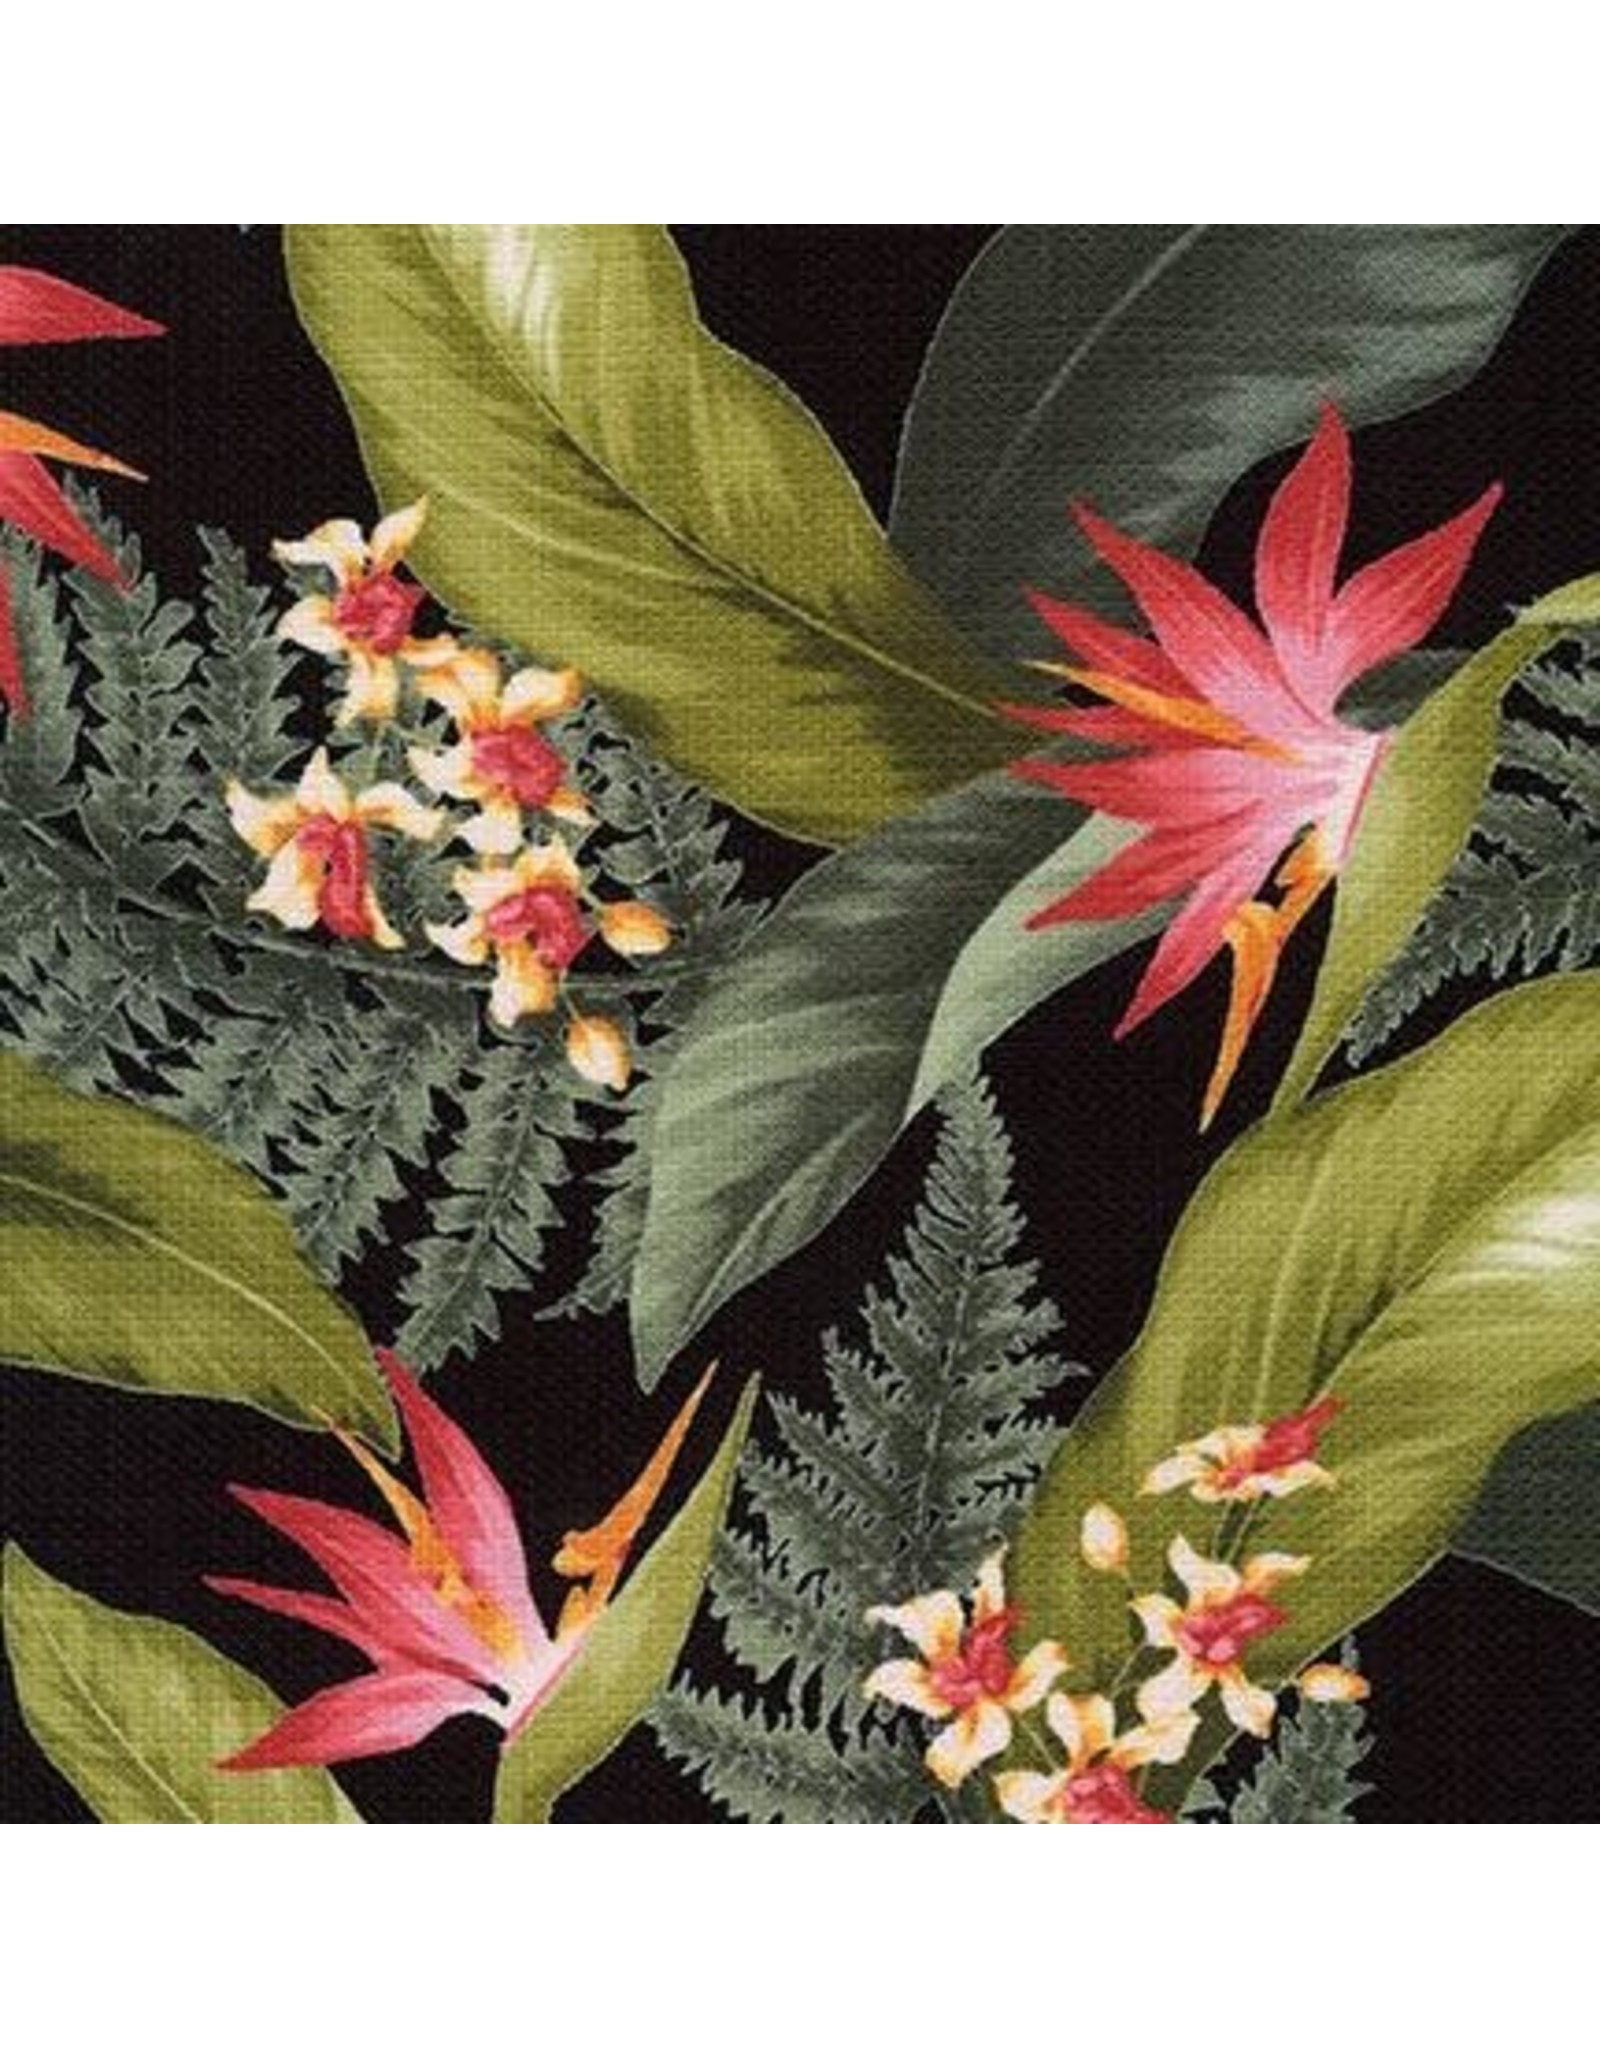 Sevenberry Barkcloth, Island Paradise, Bird of Paradise in Black, Fabric Half-Yards SB-4145D3-4